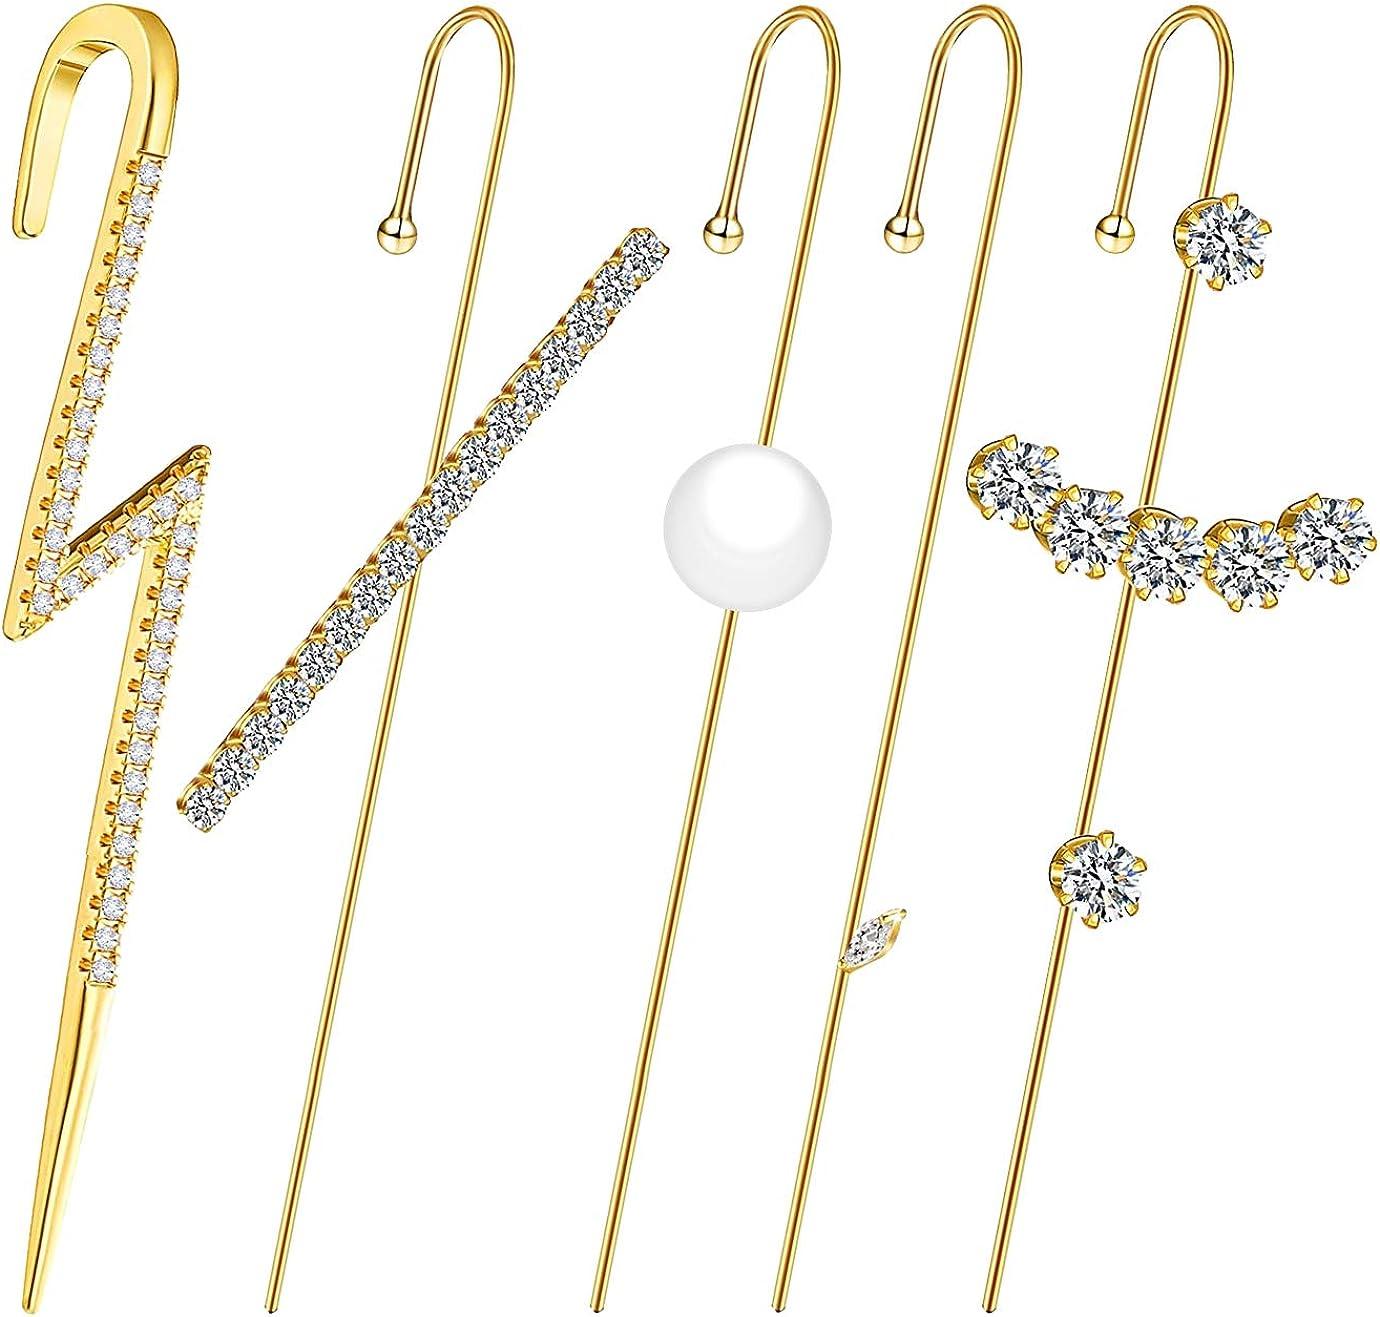 KONUNUS 5 Pieces Ear Cuffs Wrap Crawler Hook Earrings Gold